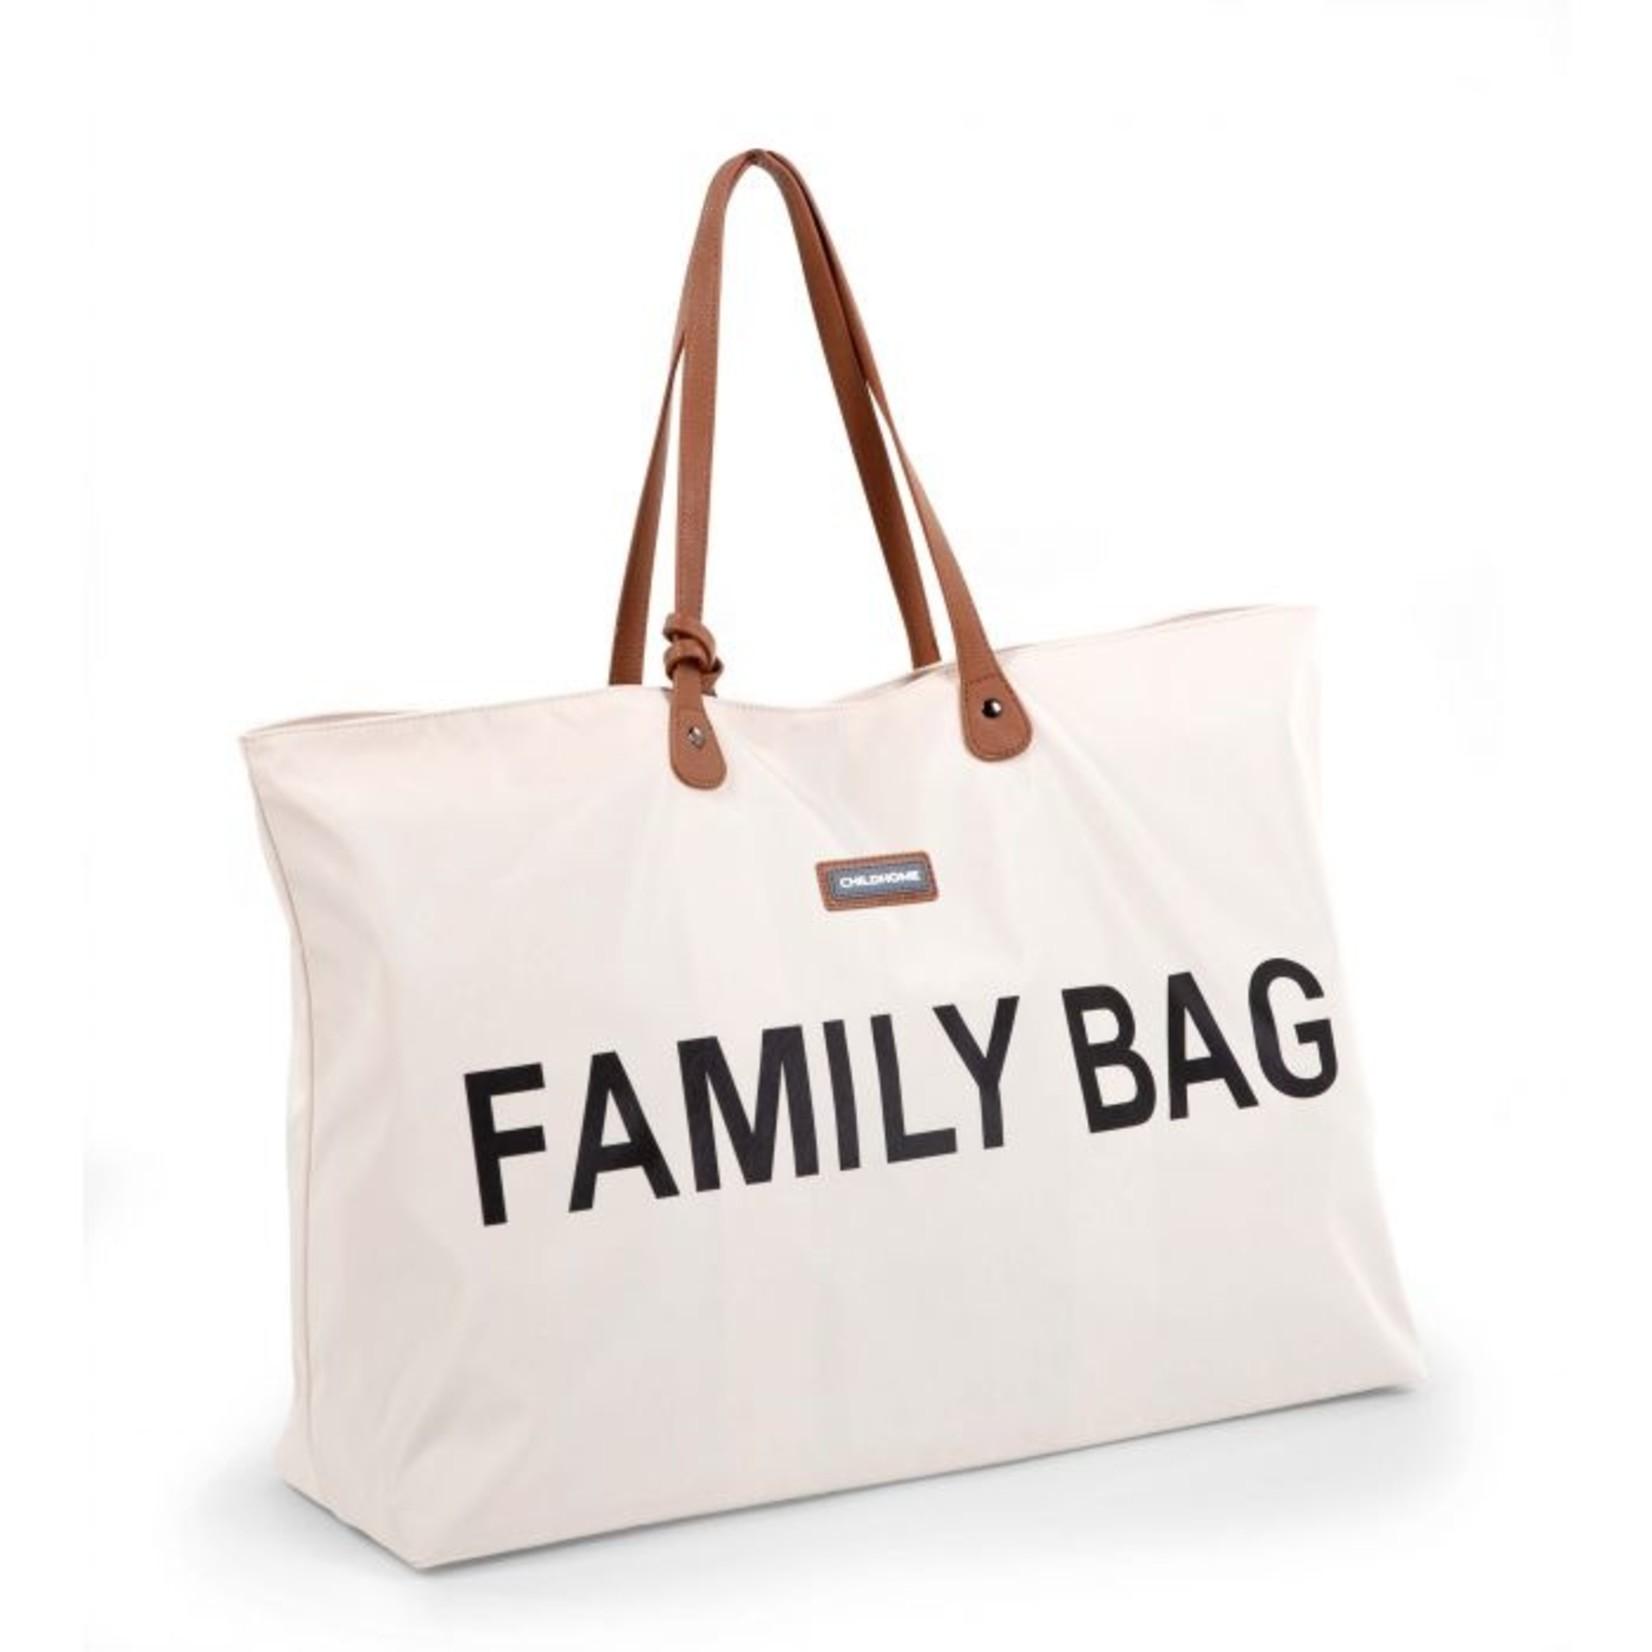 Childhome Childhome Family bag Ecru/Zwart